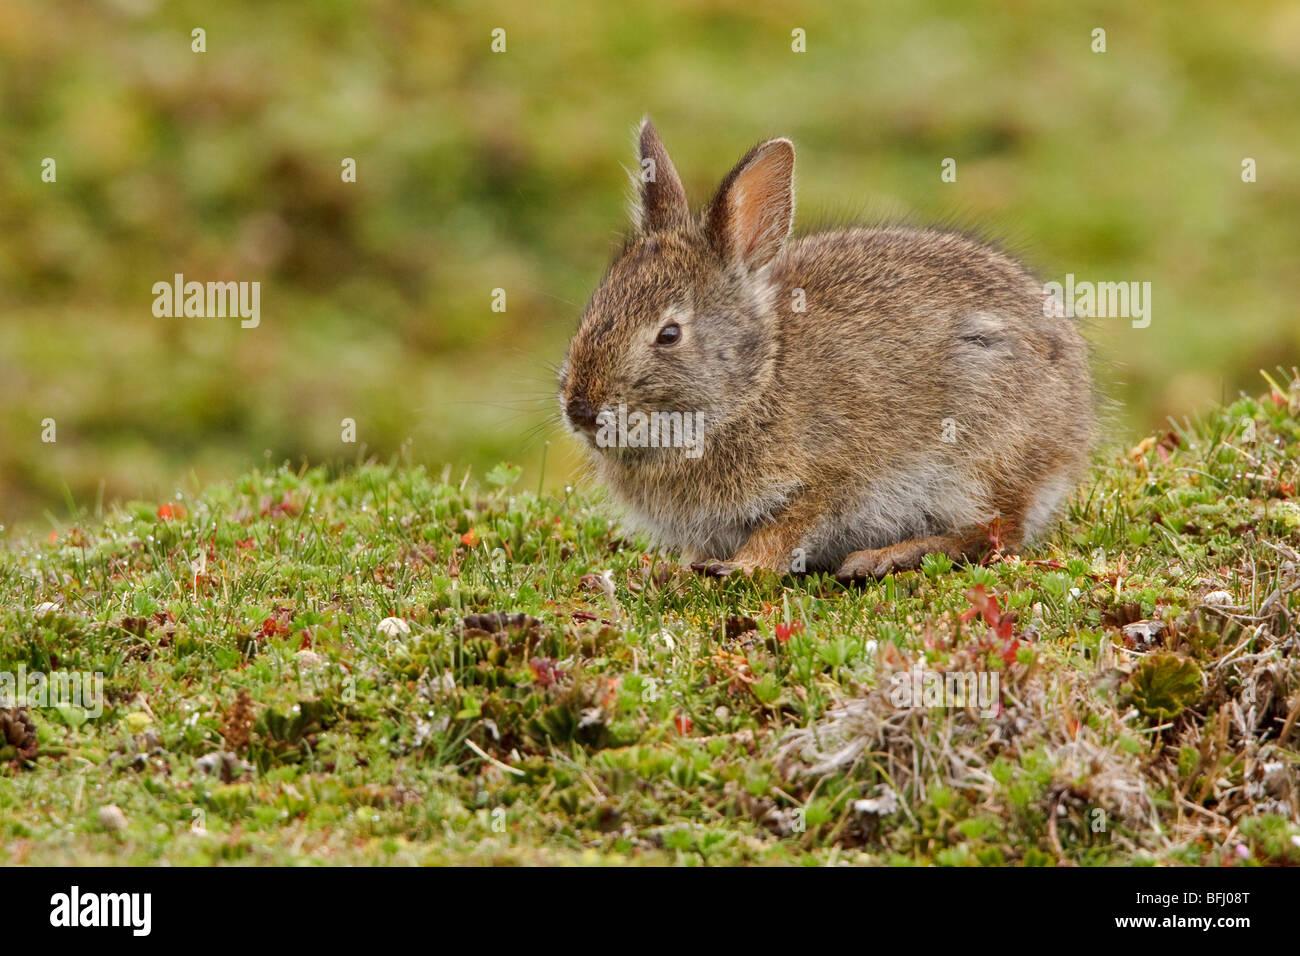 A Rabbit in the highlands of Ecuador - Stock Image